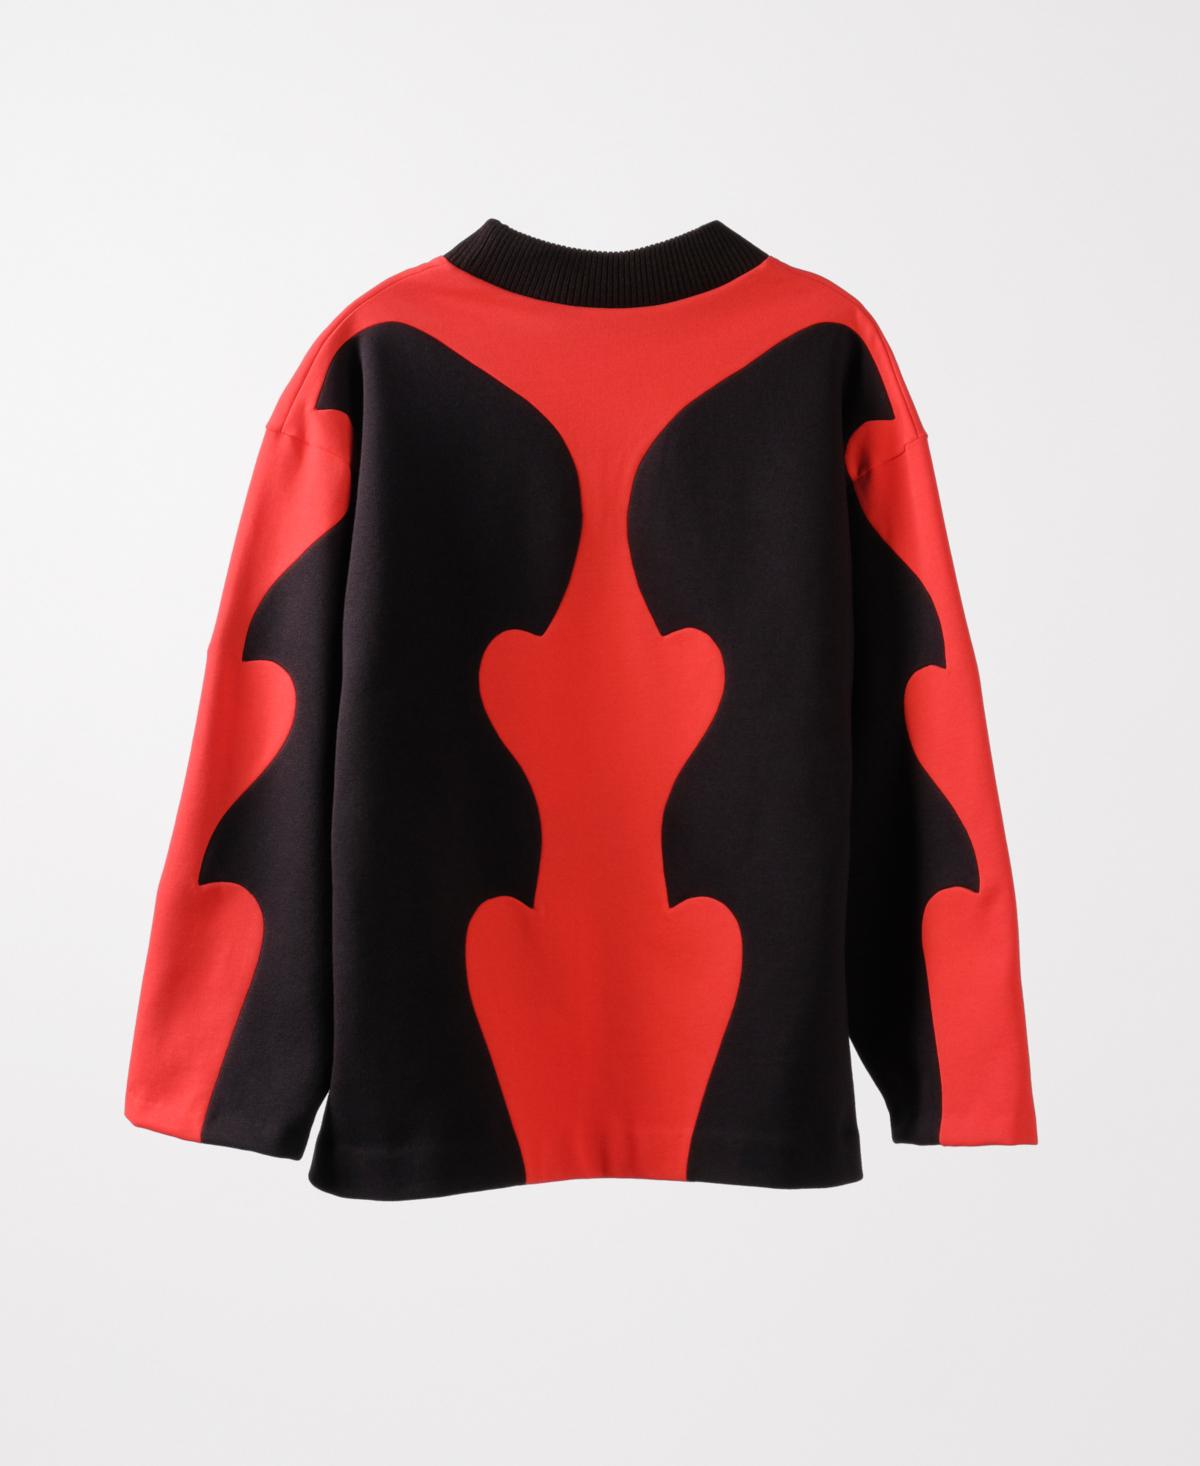 Bowie Kiss Red Sweatshirt